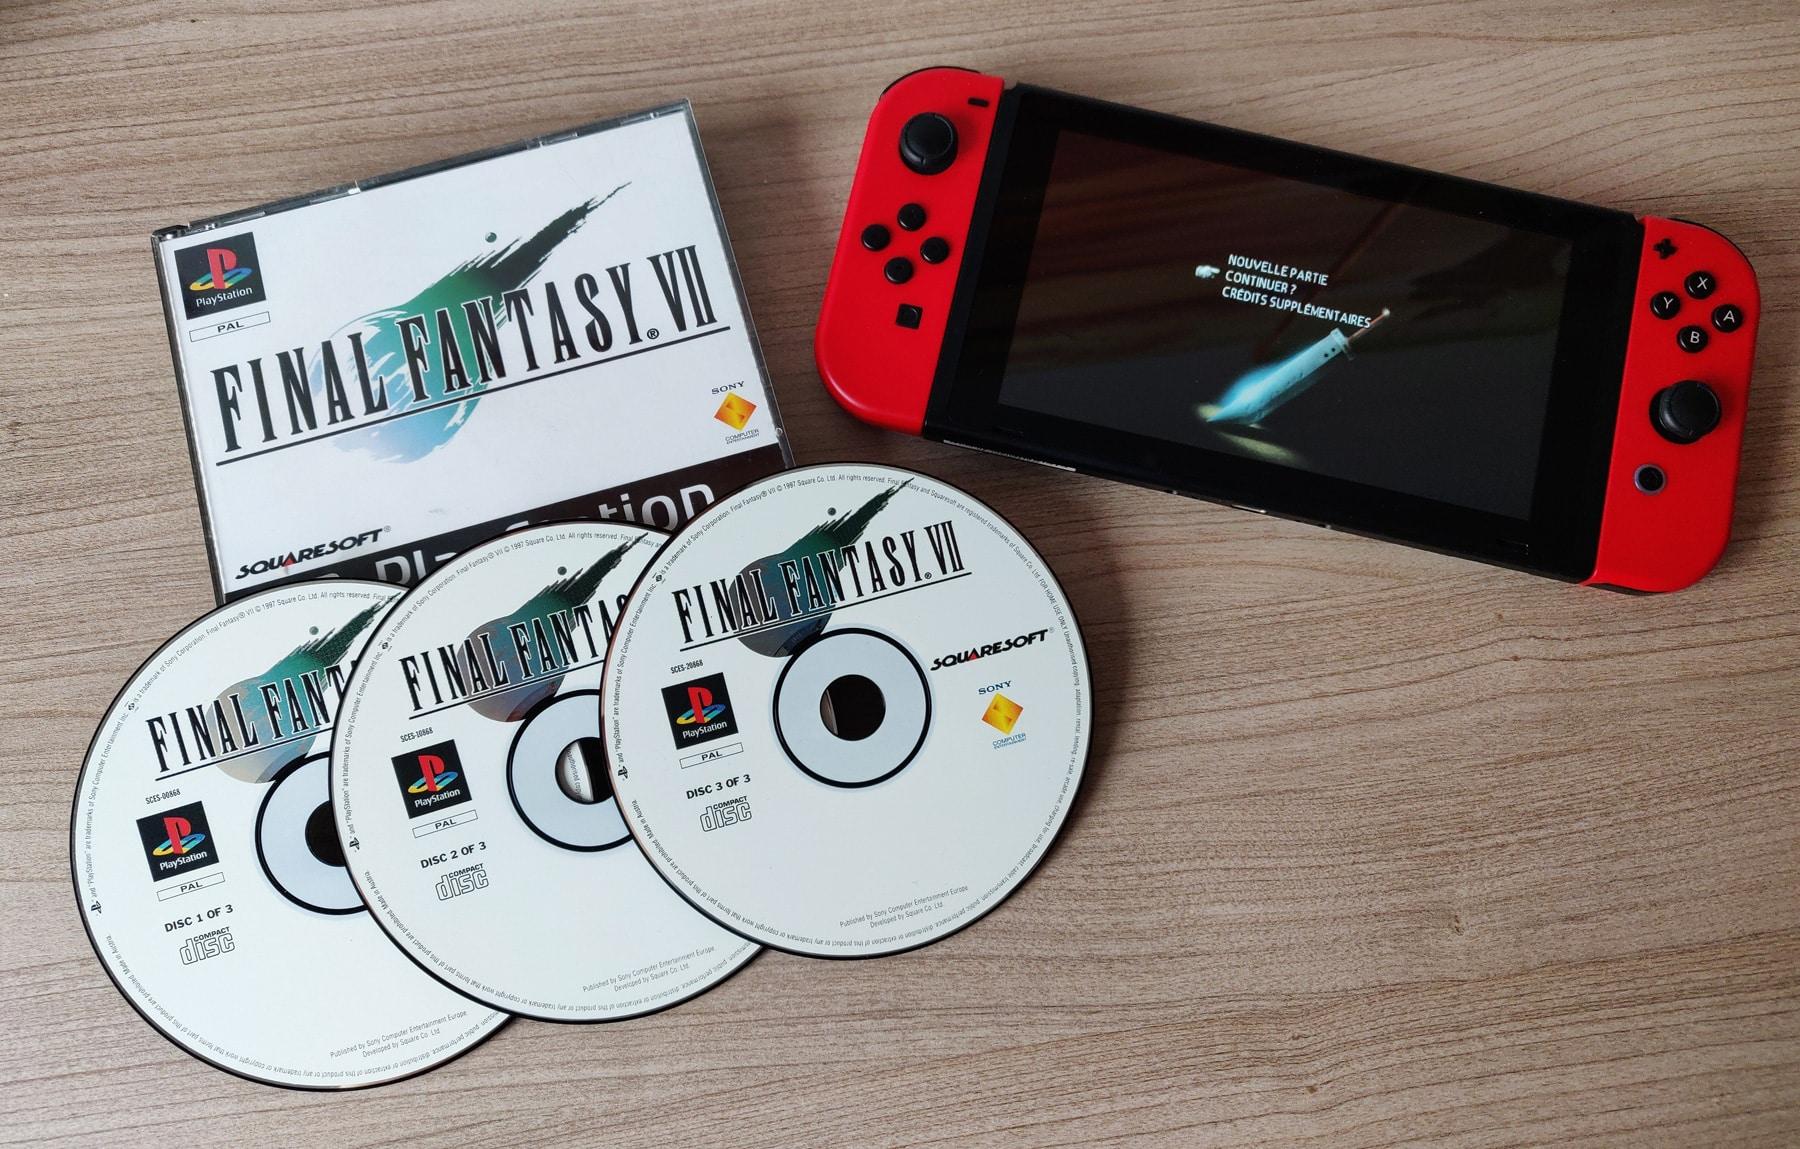 Final-Fantasy-VII-Nintendo